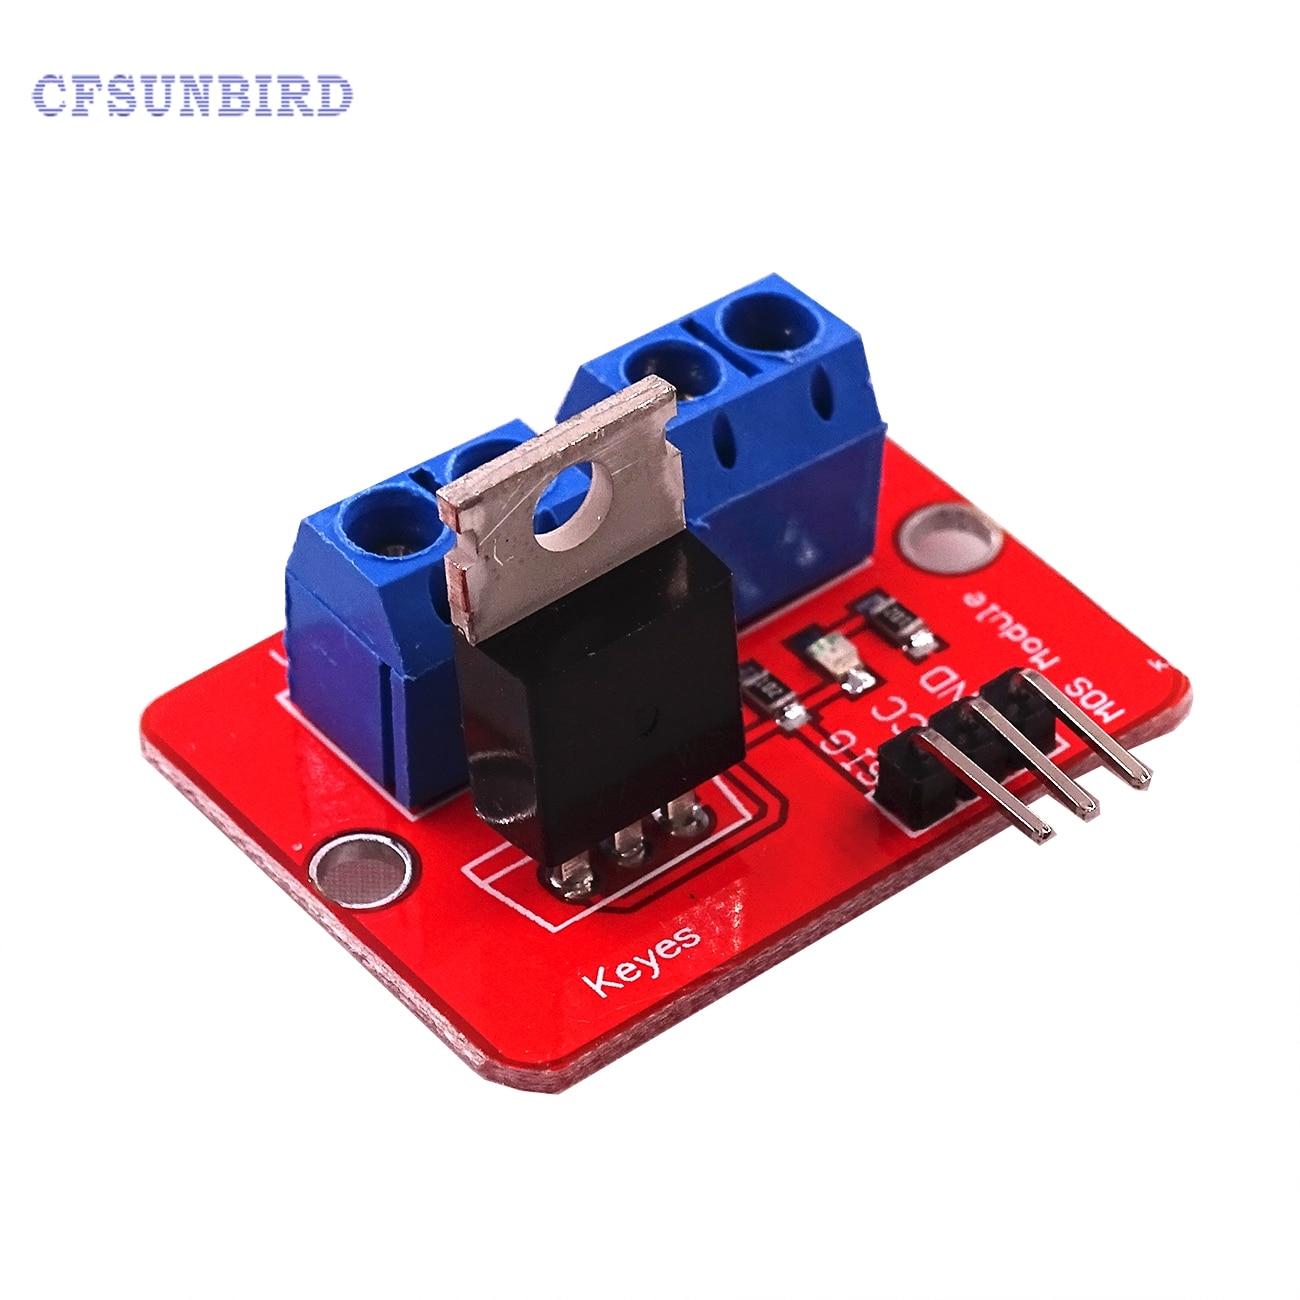 10pcs TOP MOSFET Button IRF520 MOSFET Driver Module for Arduino  ARM Raspberry pi lm2596 dc dc voltage stabilizer regulator module 5v 12v 24v adjustable for arduino raspberry pi avr arm